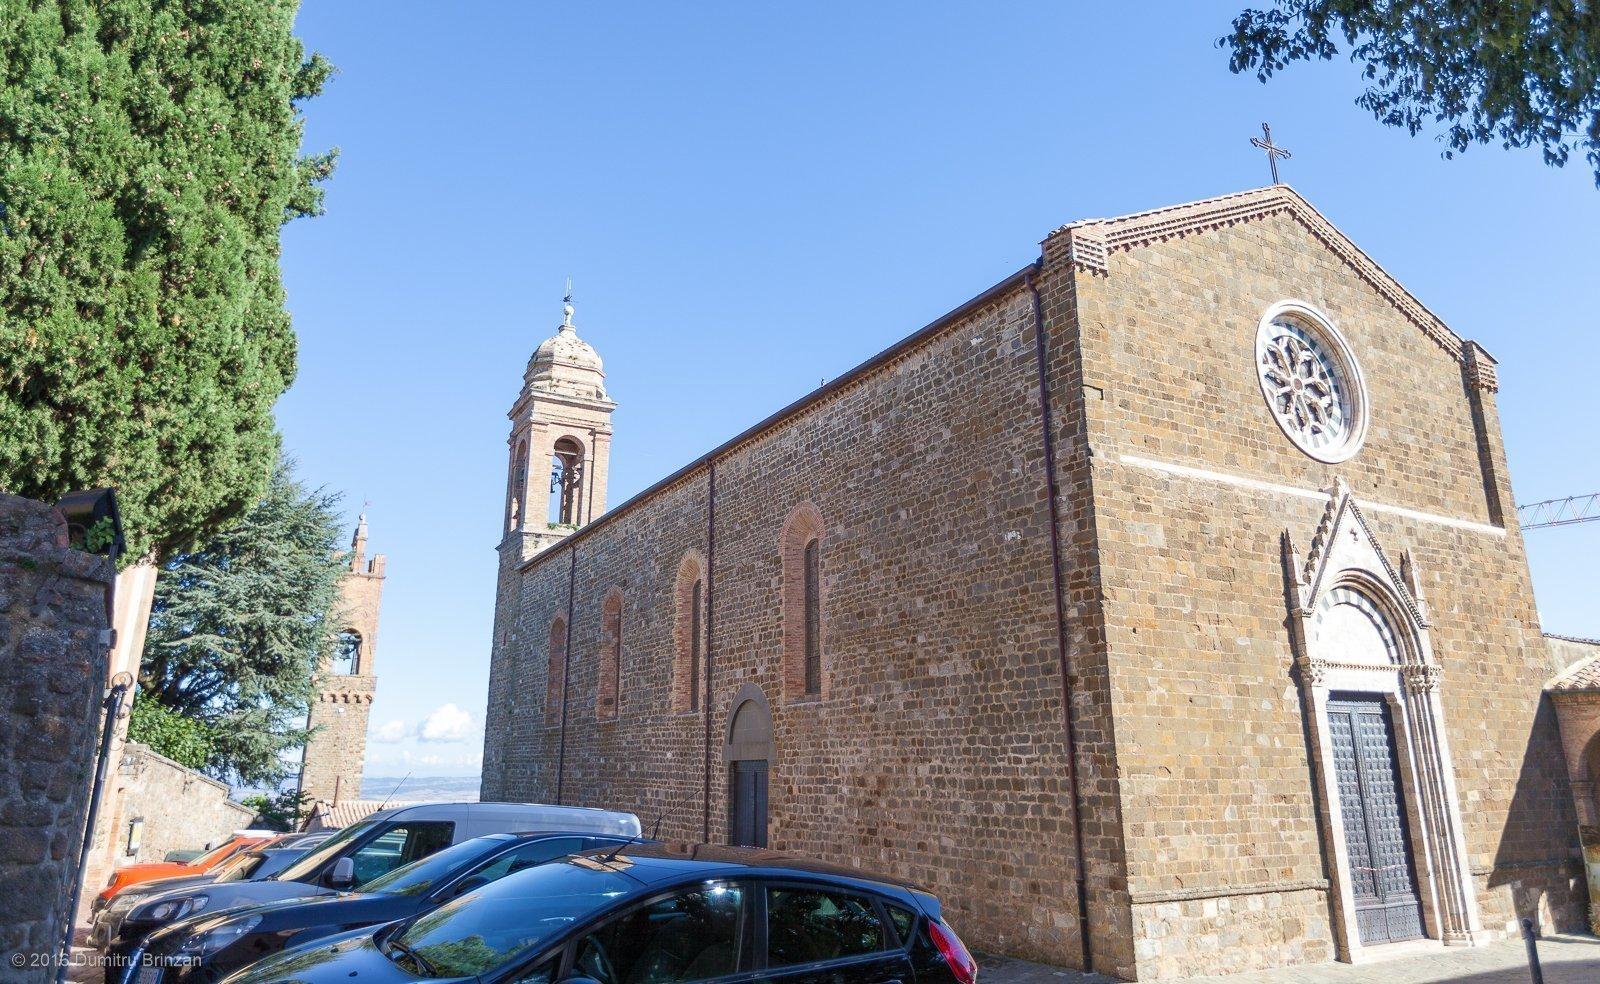 2016-montalcino-tuscany-italy-15-chiesa-di-sant-agostino